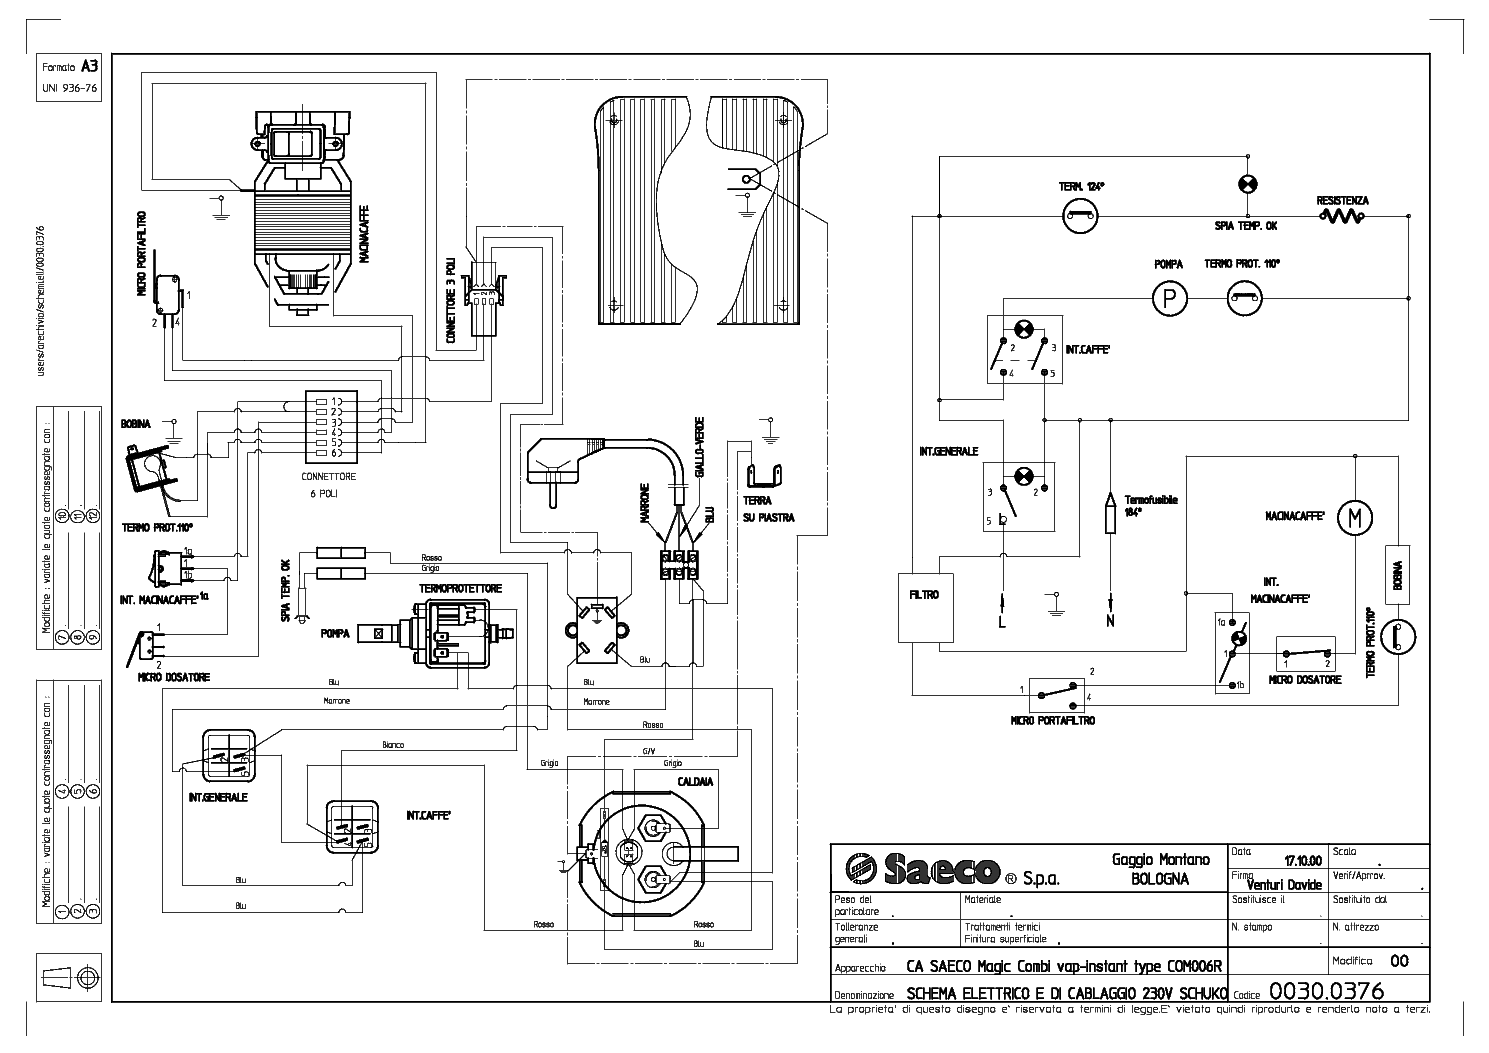 saeco via venezia manual pdf